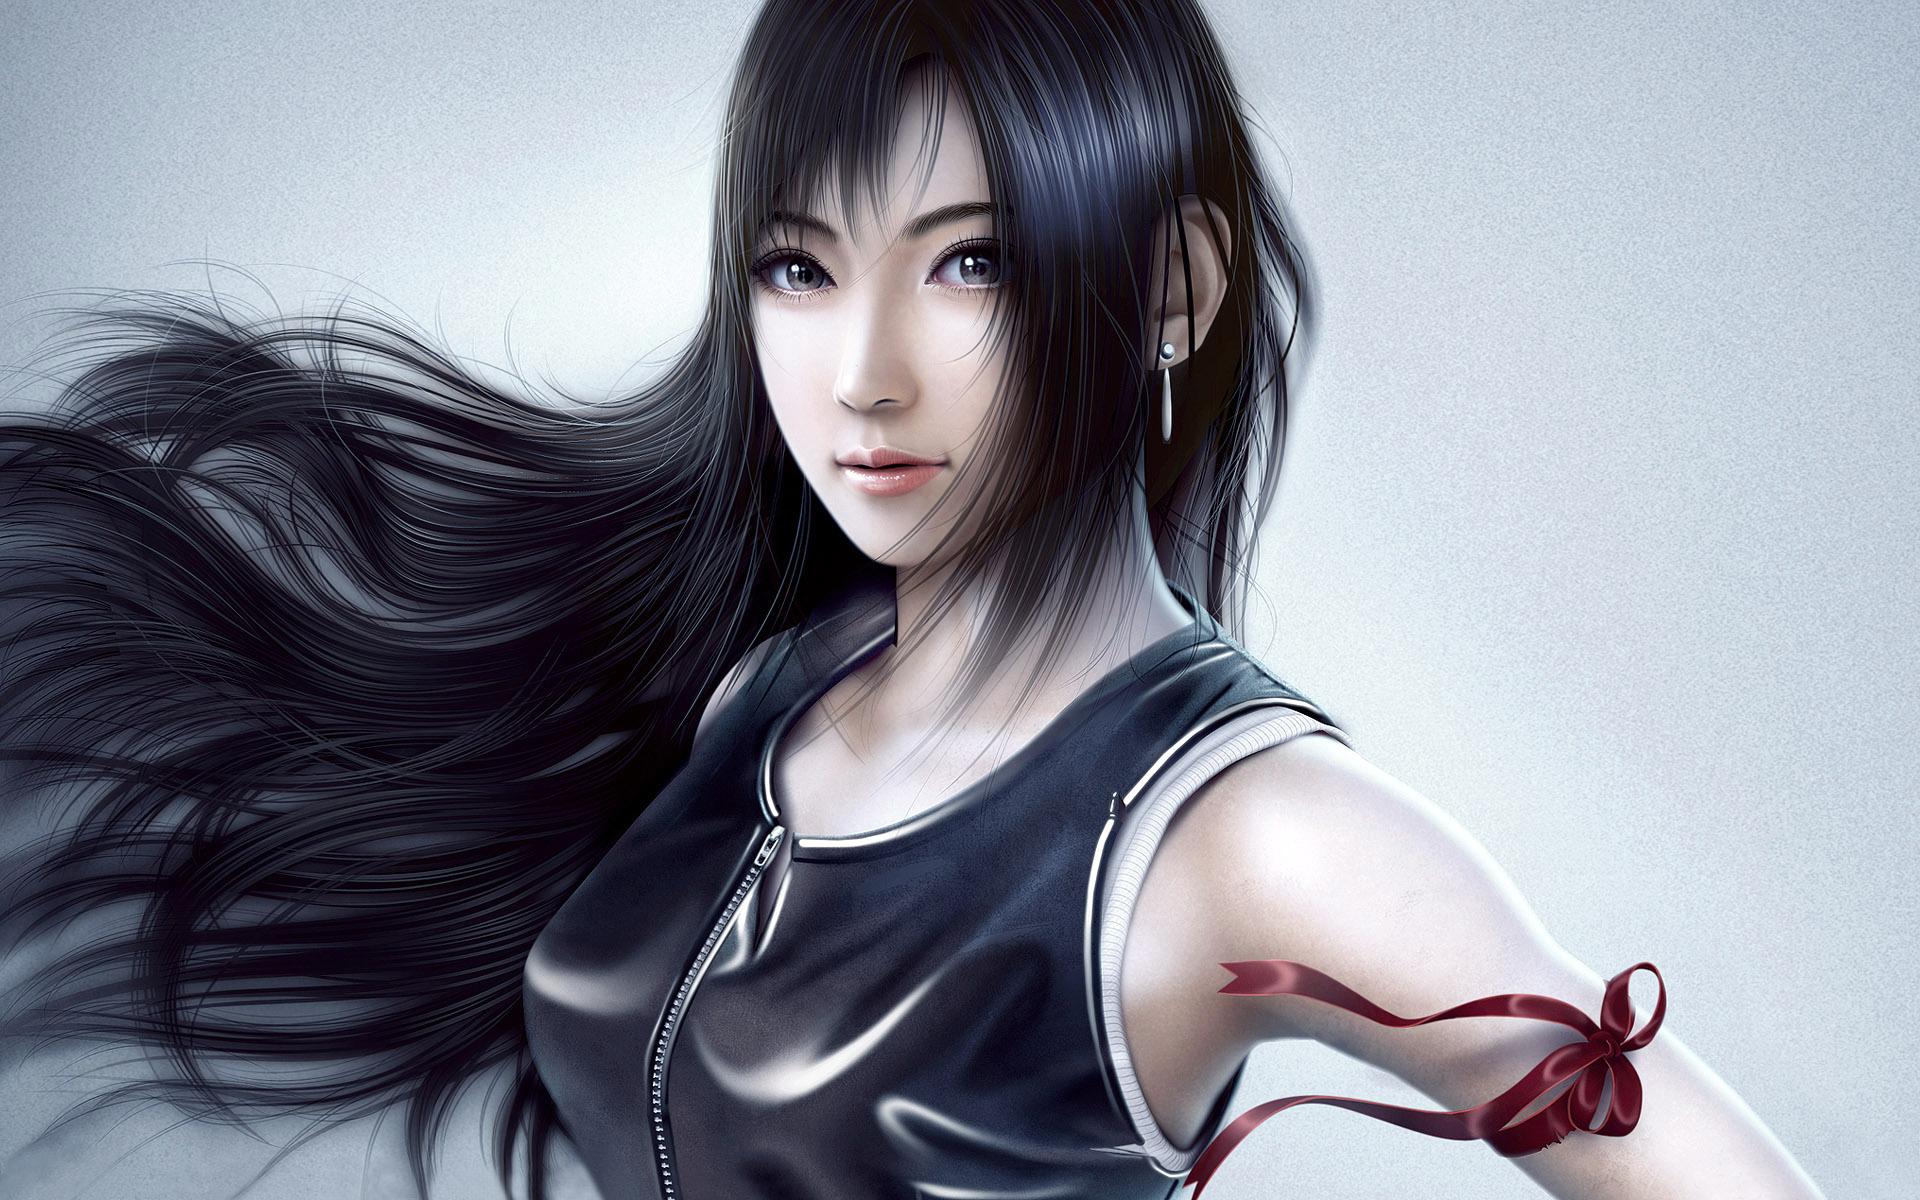 Final Fantasy Tifa Lockhart Digital